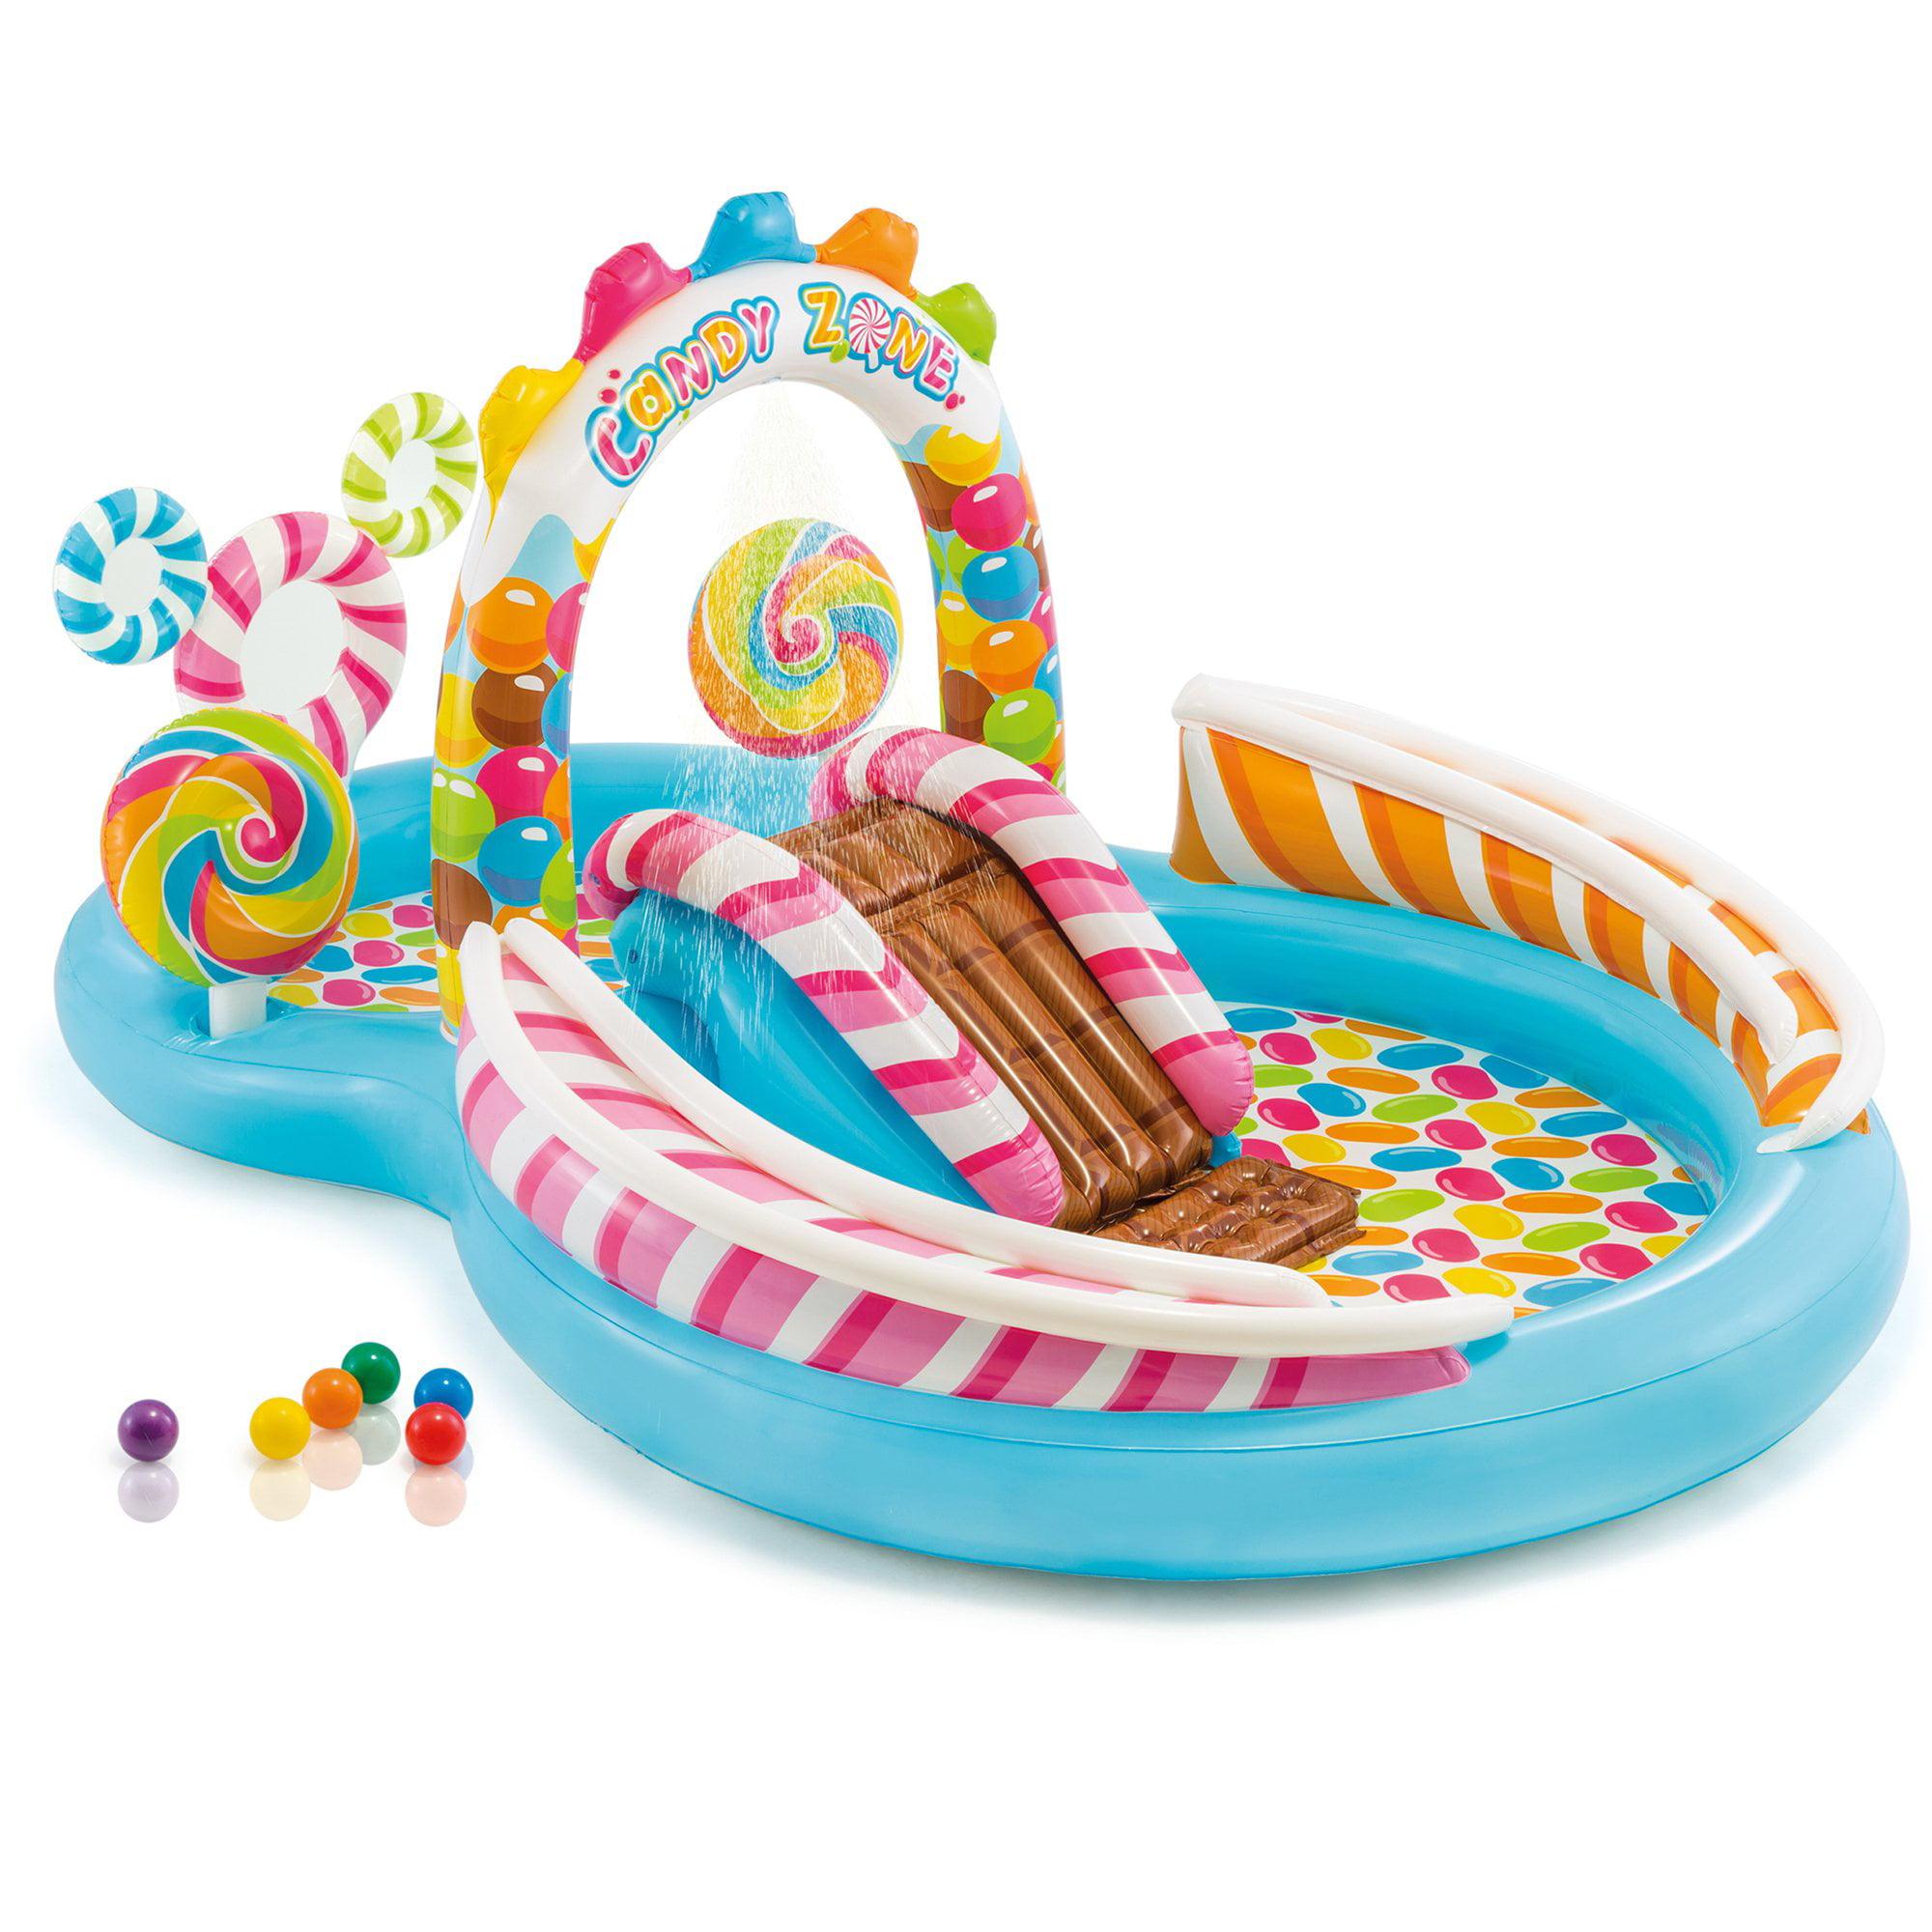 Intex Kids Inflatable Candy Zone Swim Play Center Kids Splash Pool w/ Waterslide